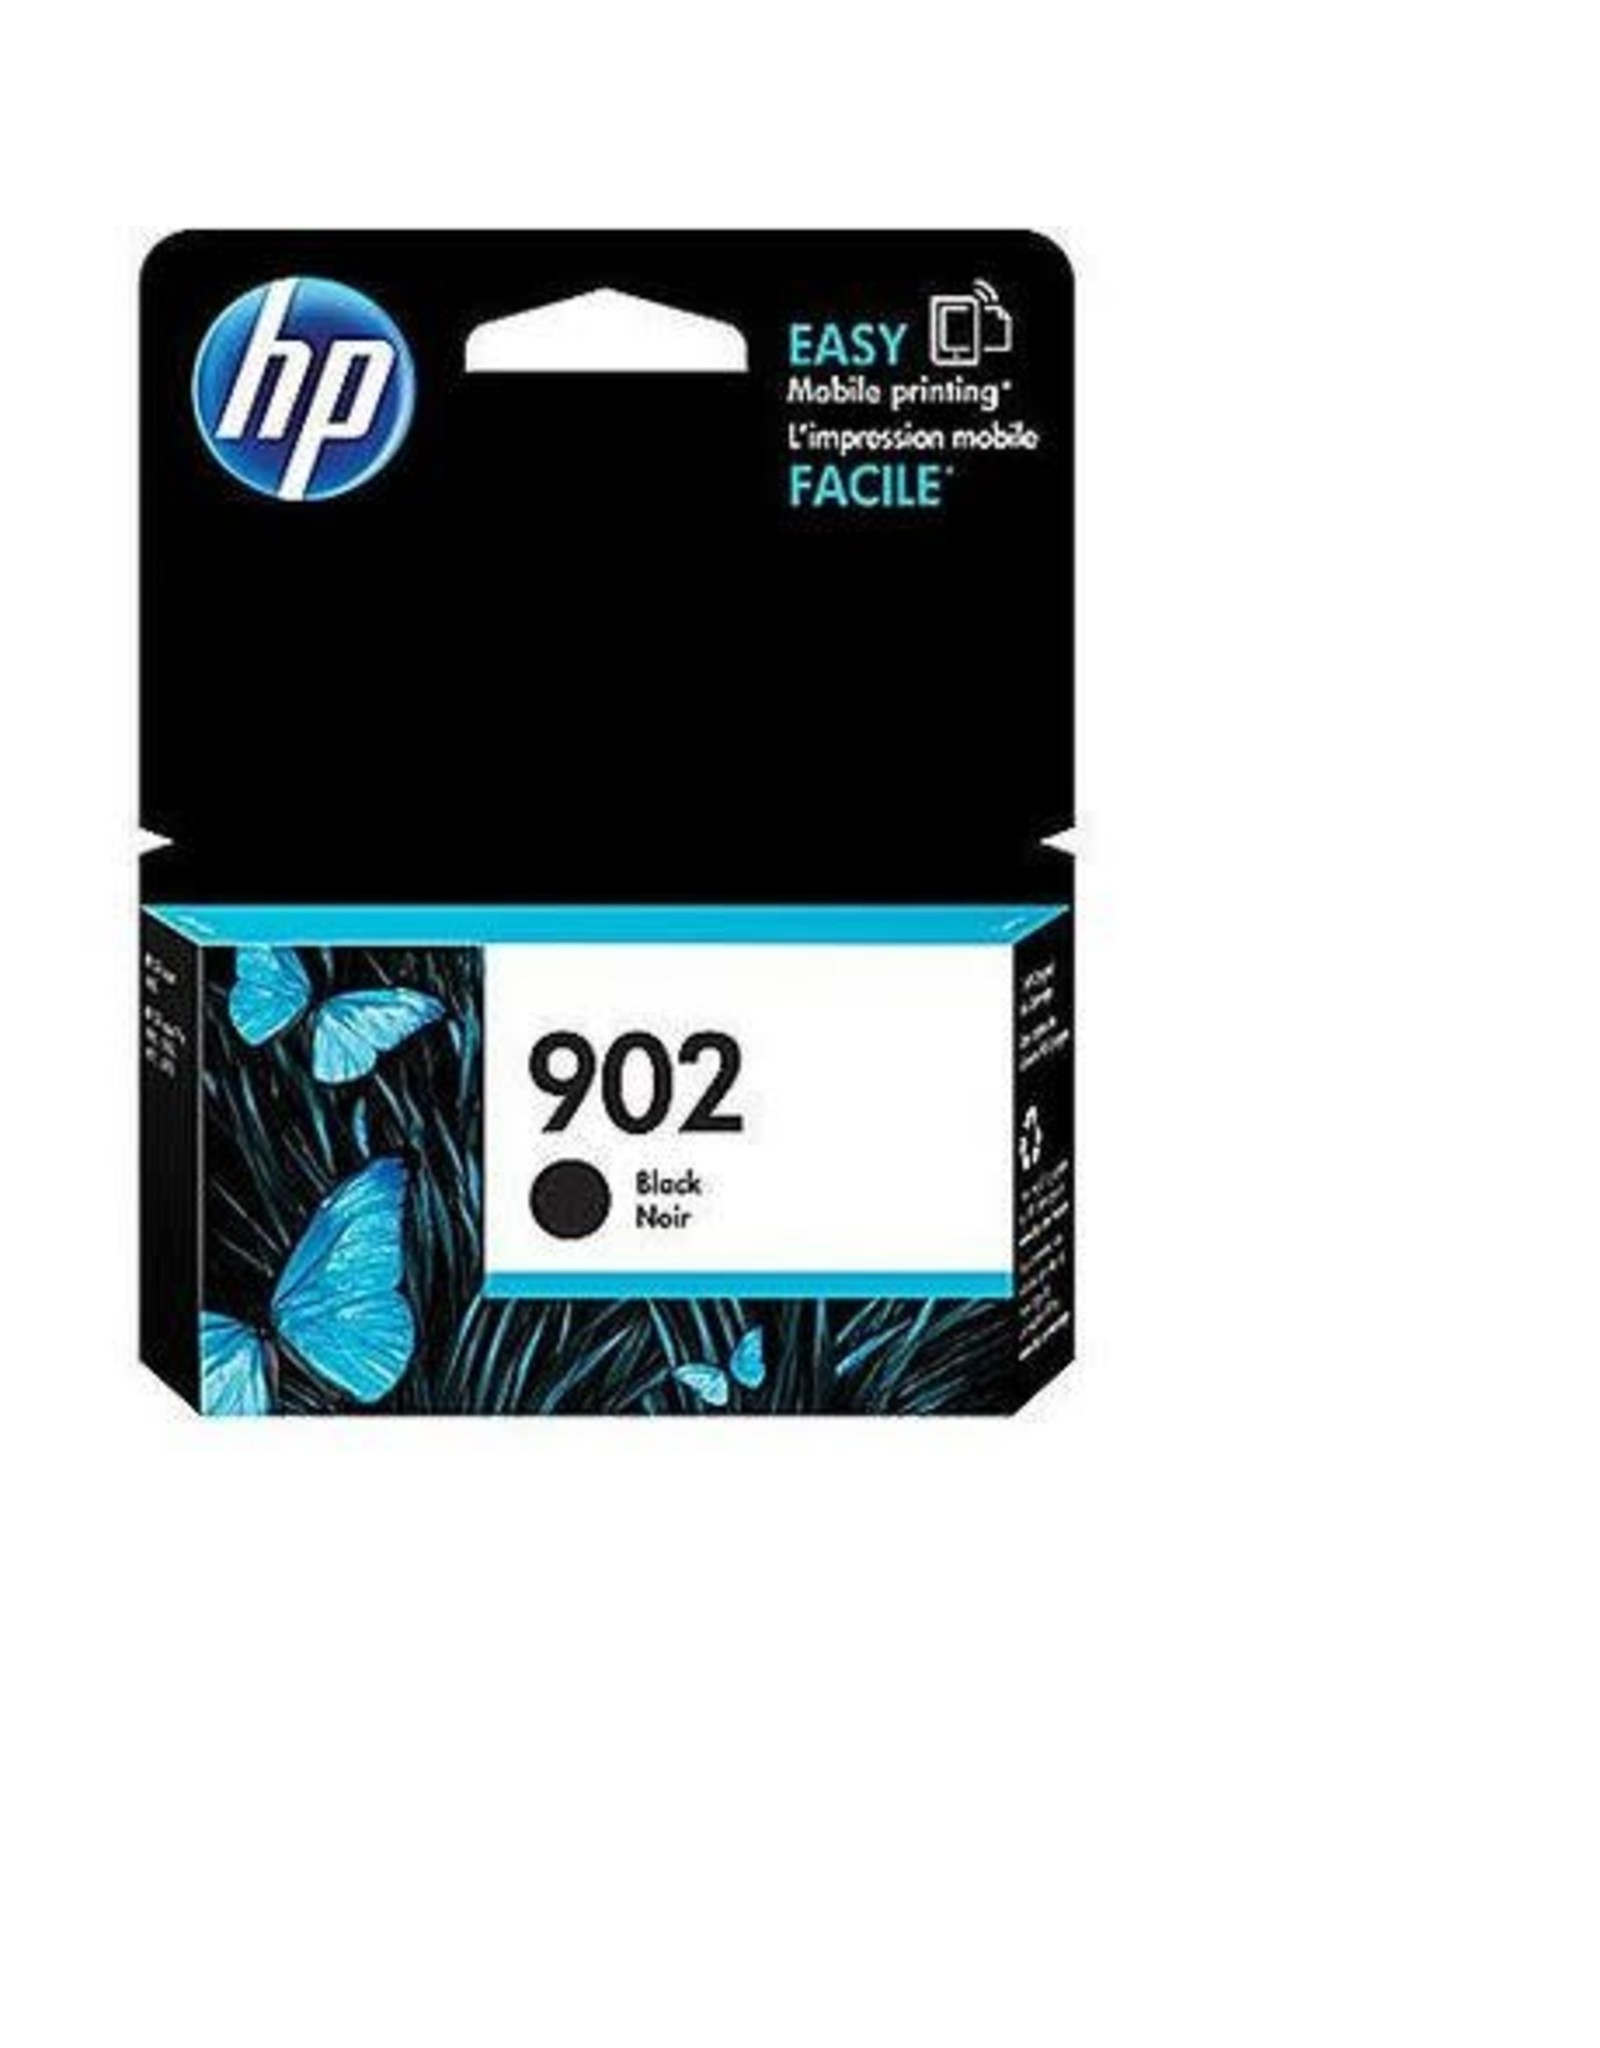 HP INKJET CARTRIDGE-HP #902 BLACK